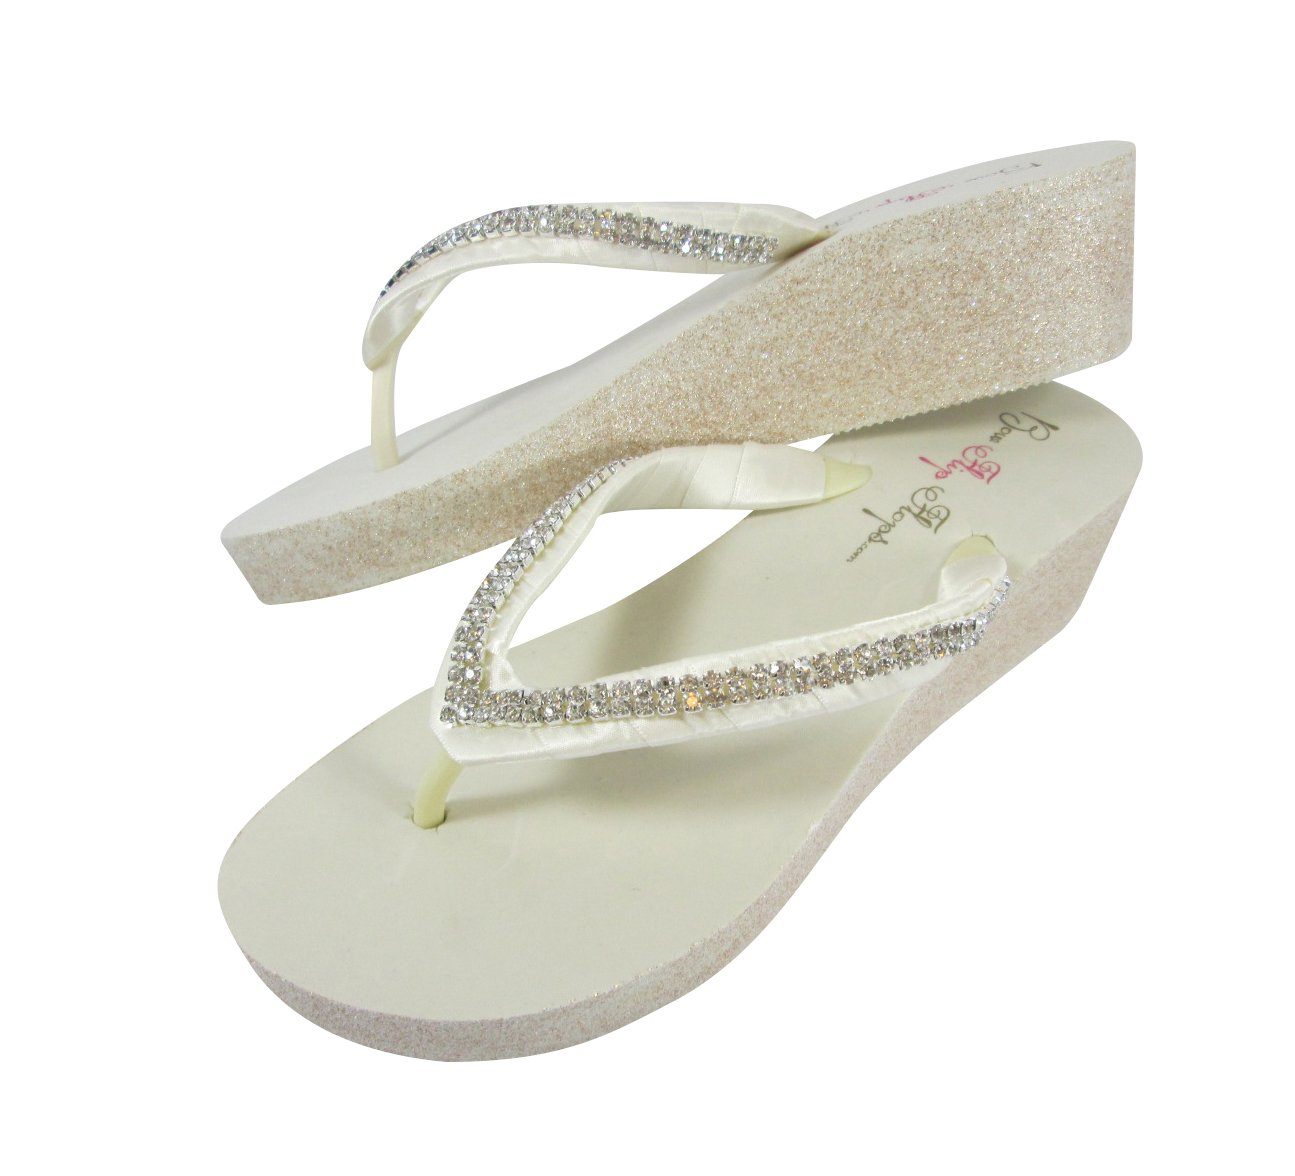 b2cf42d2e6340 Amazon.com  Diamond 2 inch Platform Flip Flops with Rhinestone Wedge  Glitter Heel- Ivory and Champagne Bling  Handmade